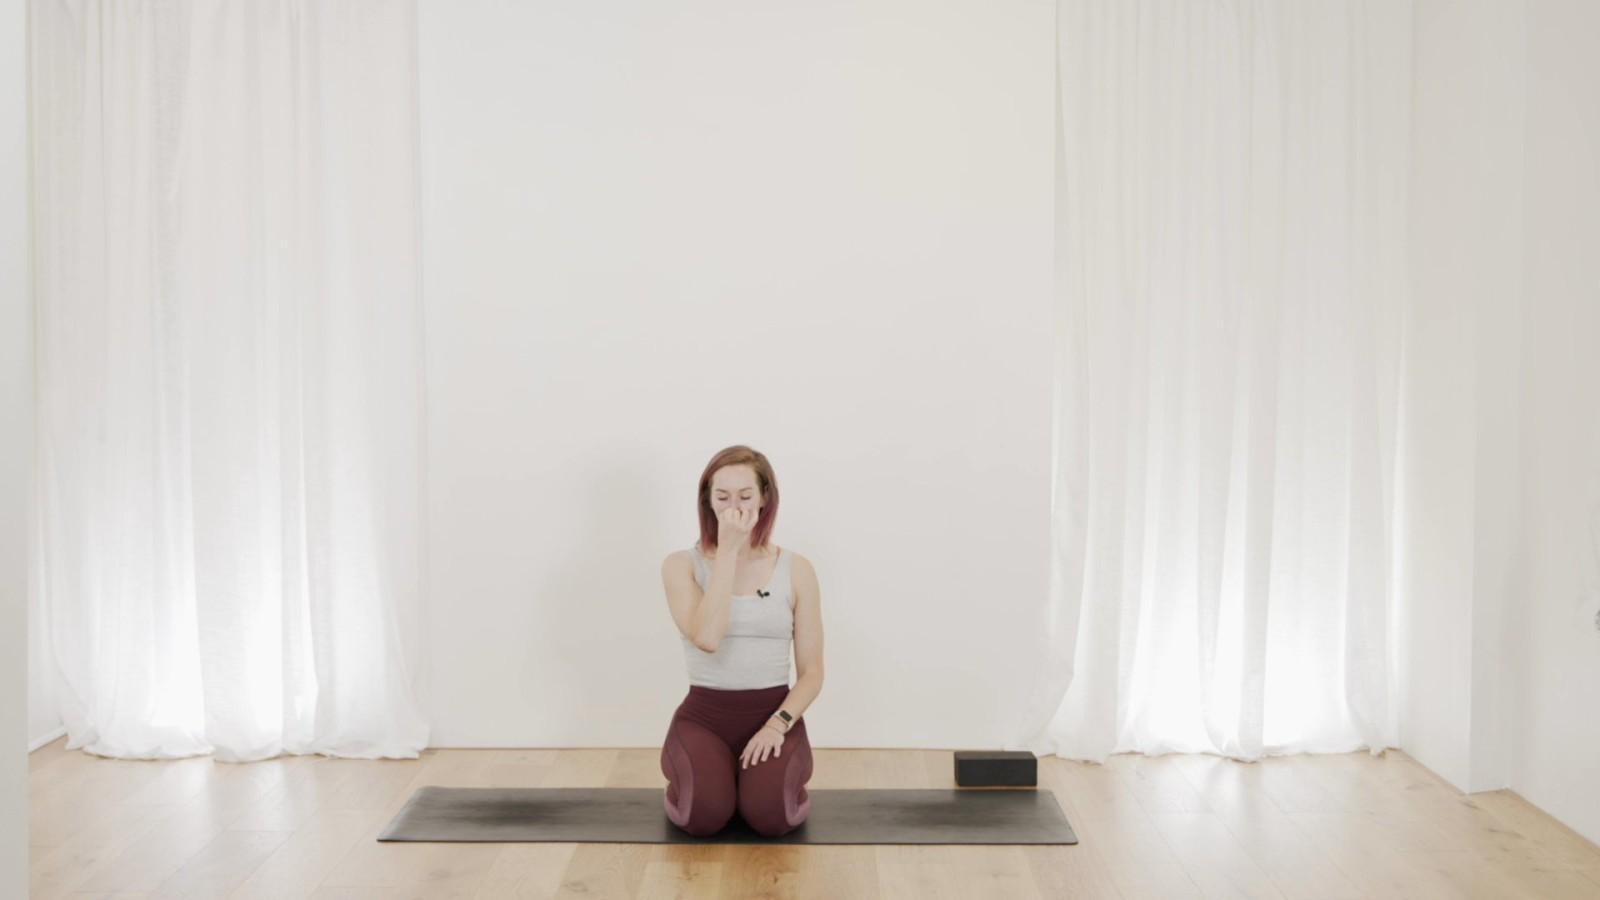 Morning Pranayama Practice with Vicky Chapman